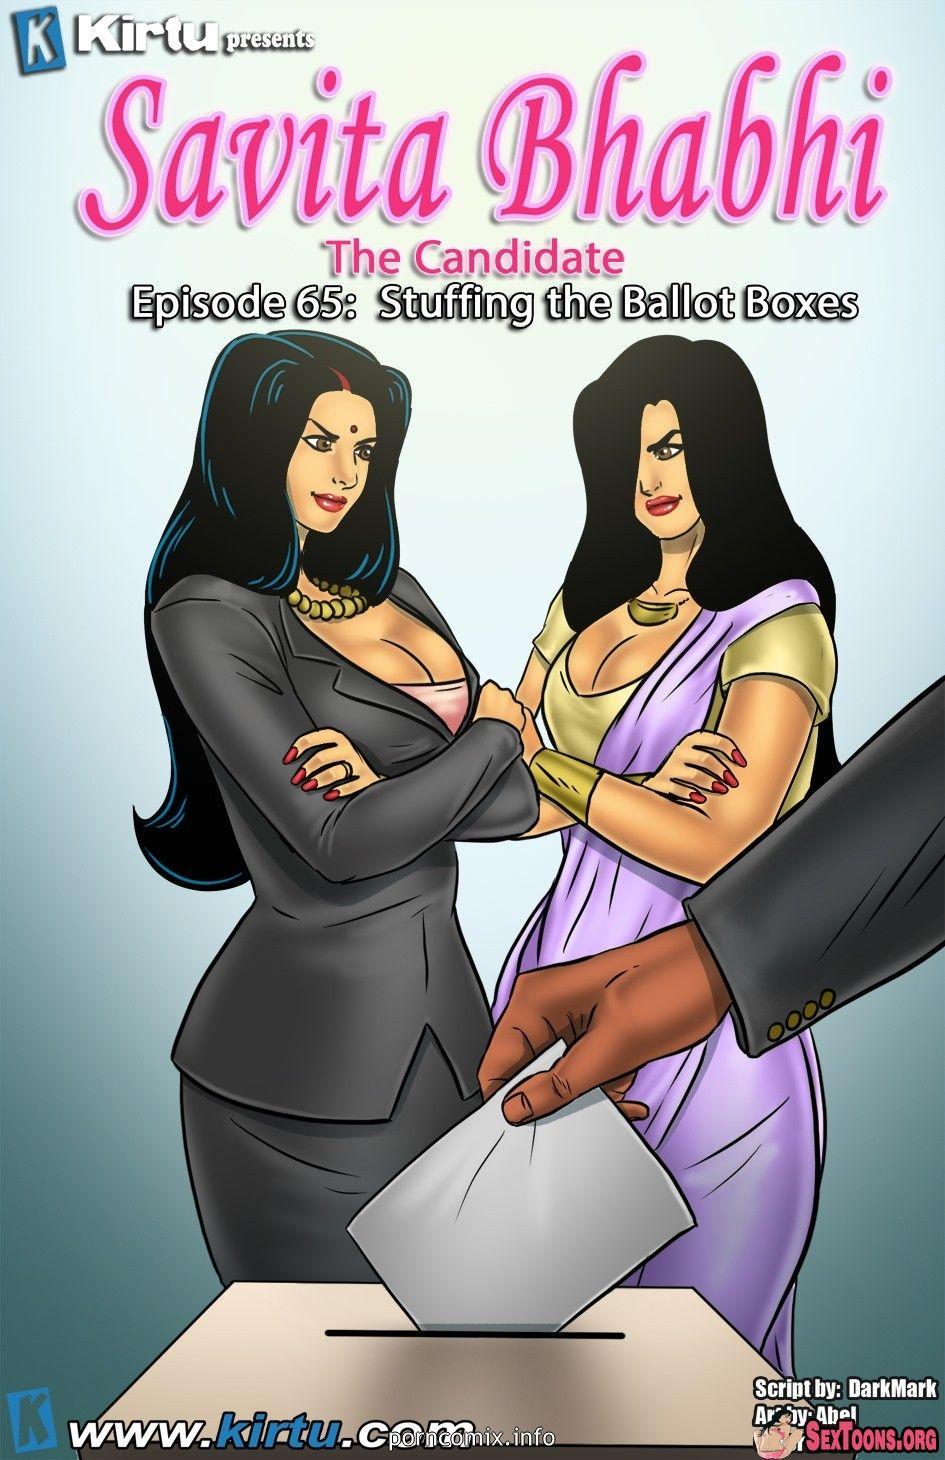 Savita Bhabhi  Episode 65  The Candidate  Stuffing The -9927